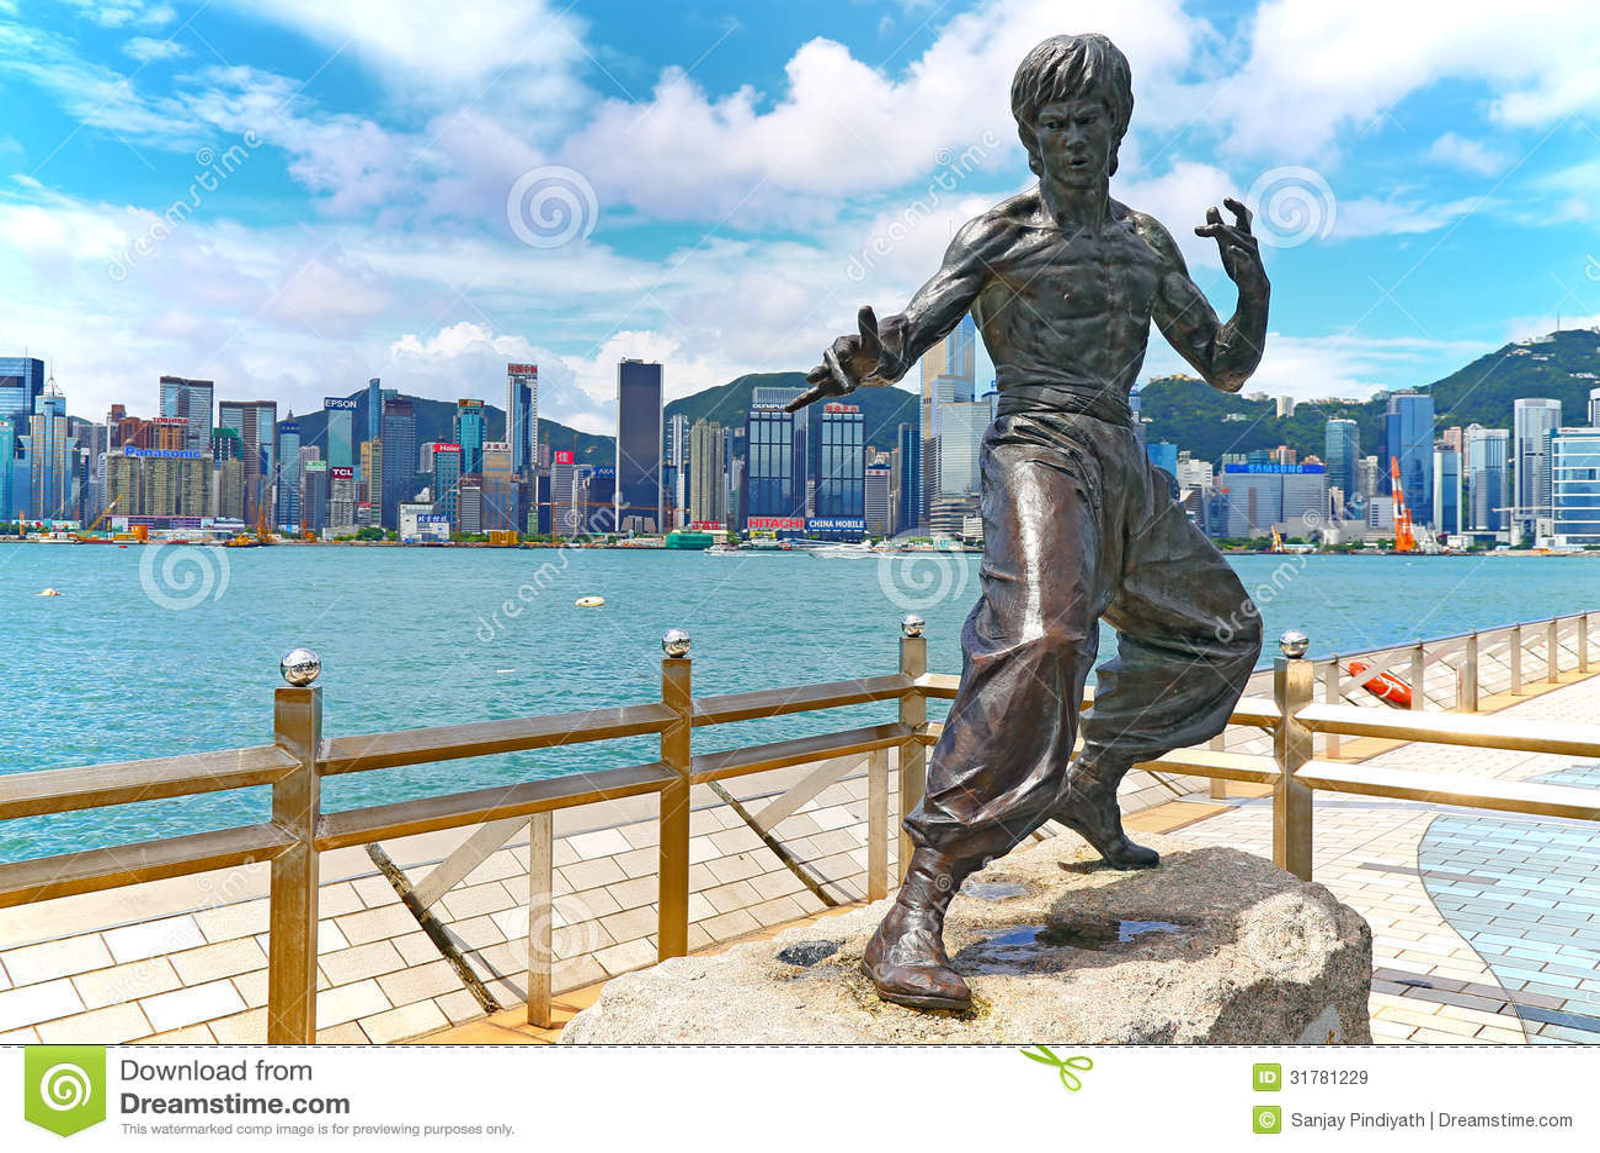 statue-bruce-lee-hong-kong-meter-bronze-